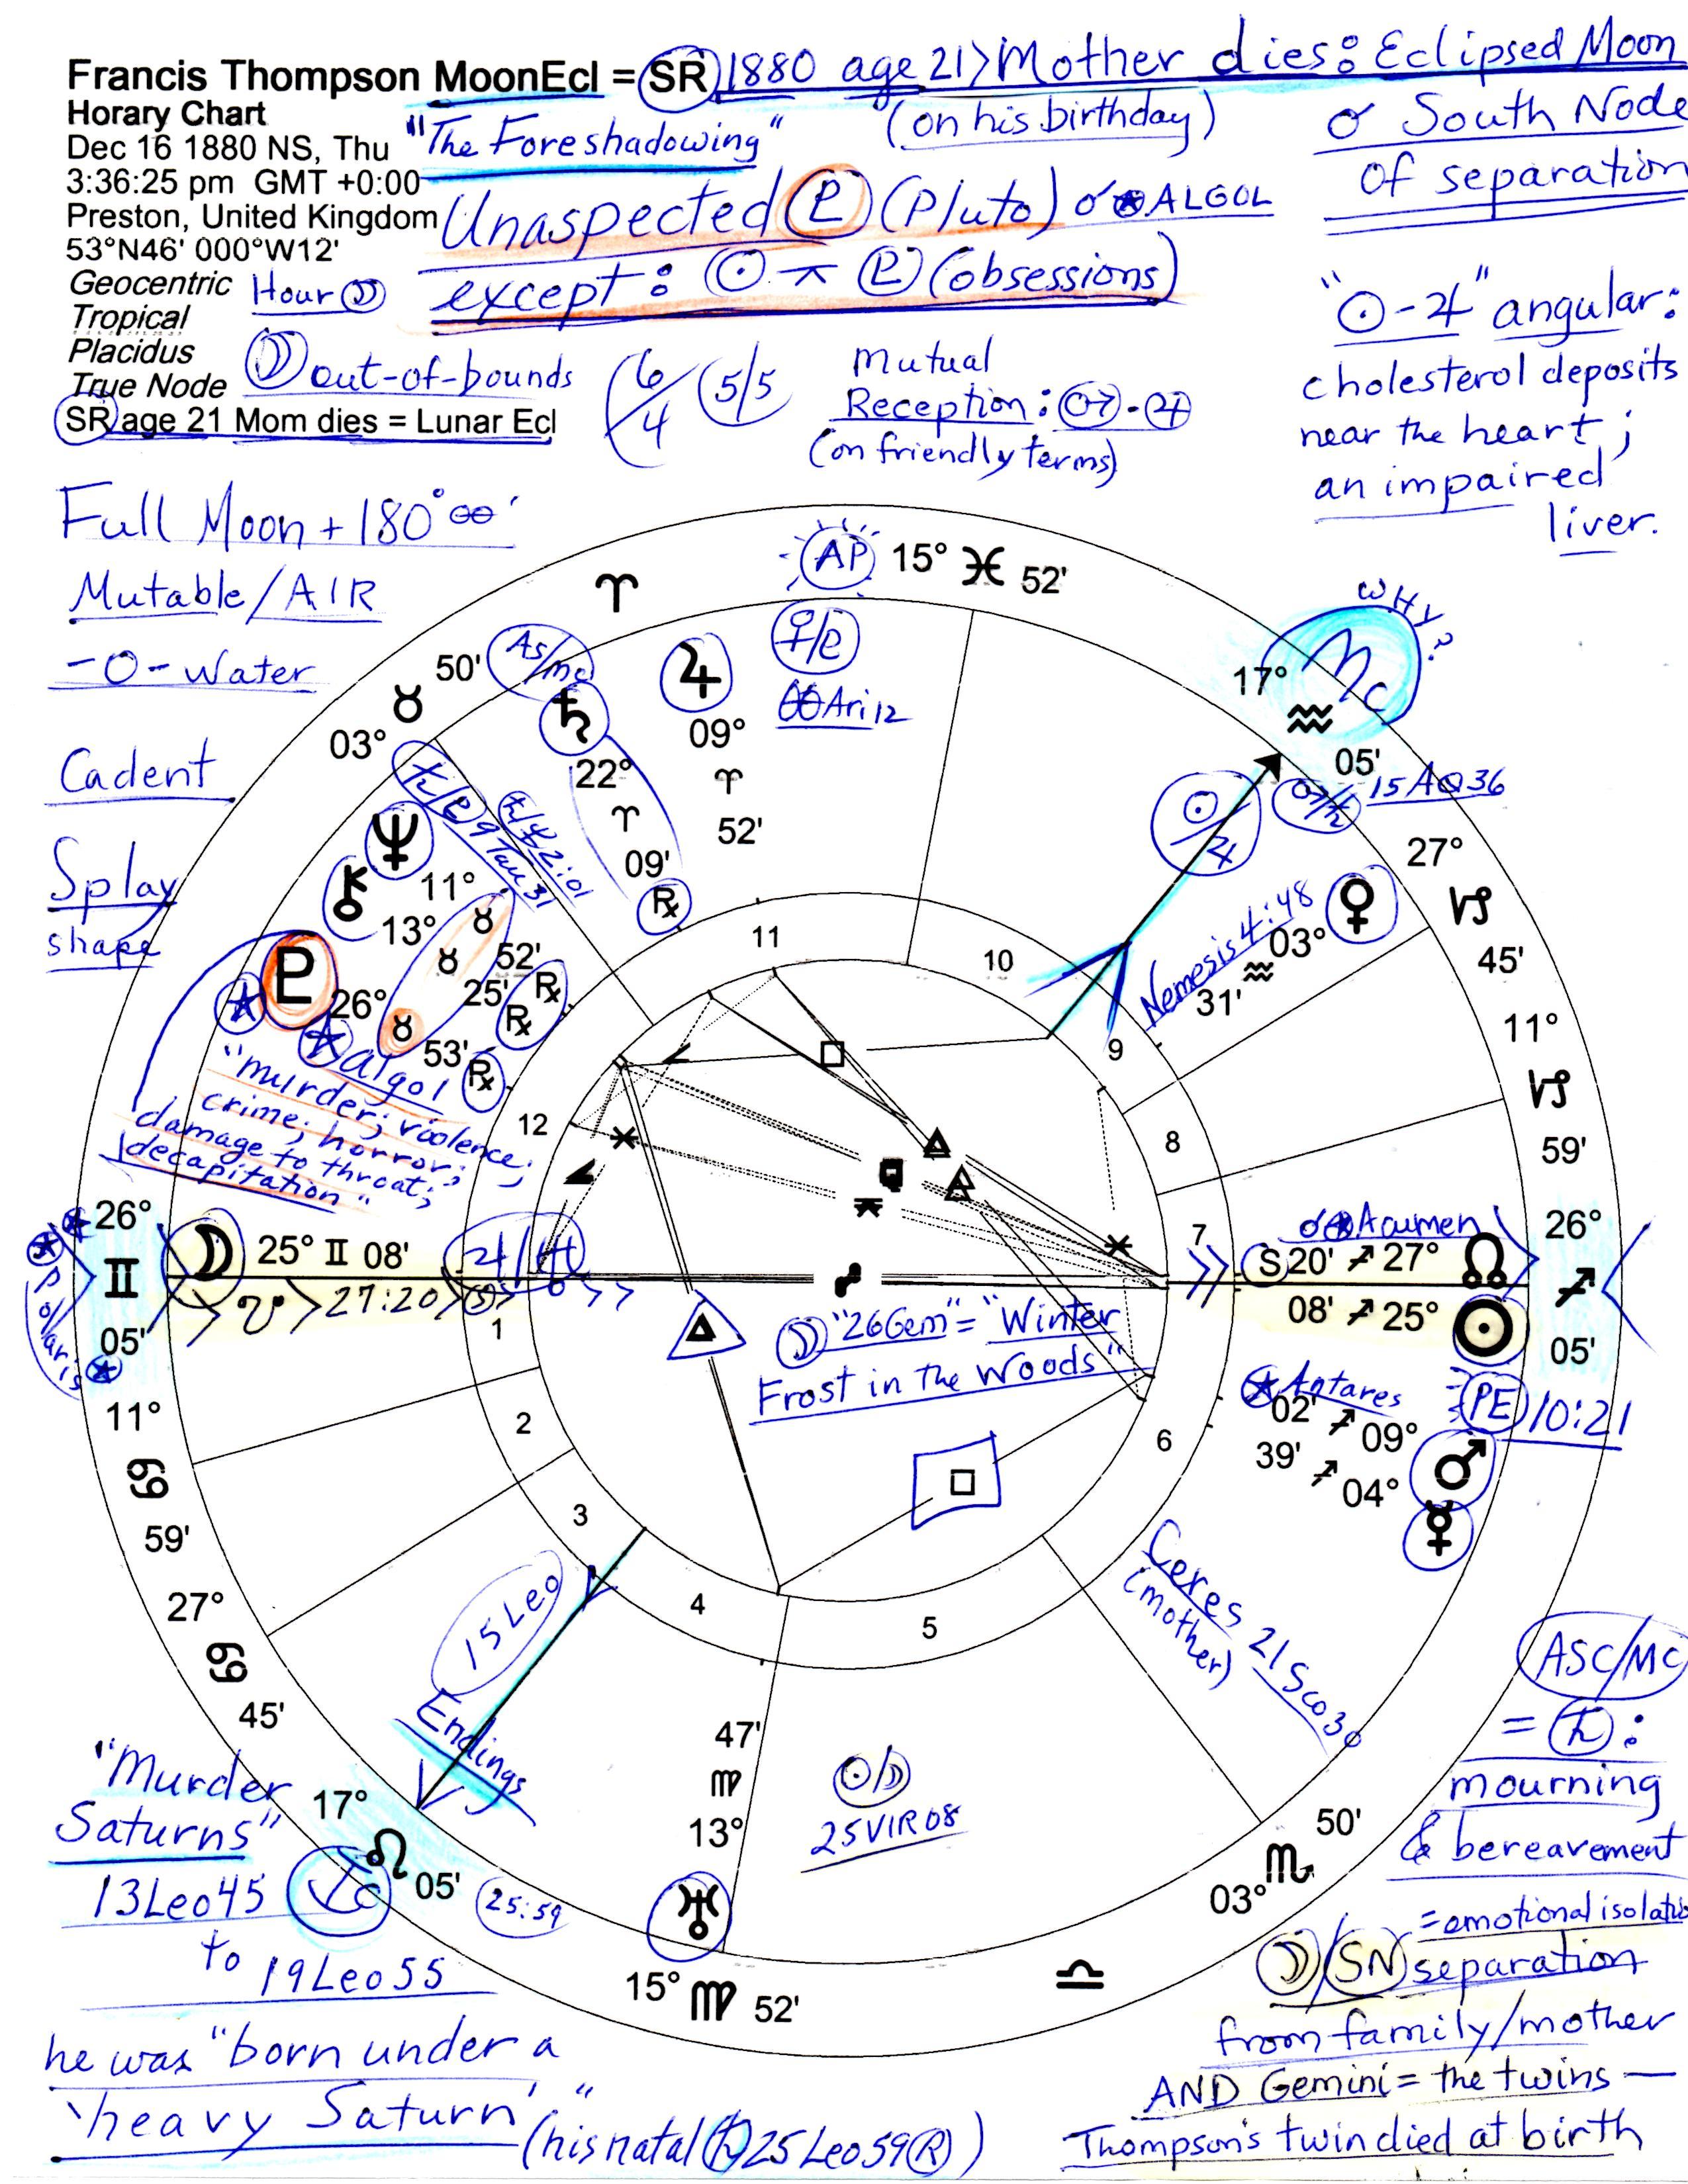 Forensic astrology judes threshold gemini lunar eclipse dec 16 1880 geenschuldenfo Image collections